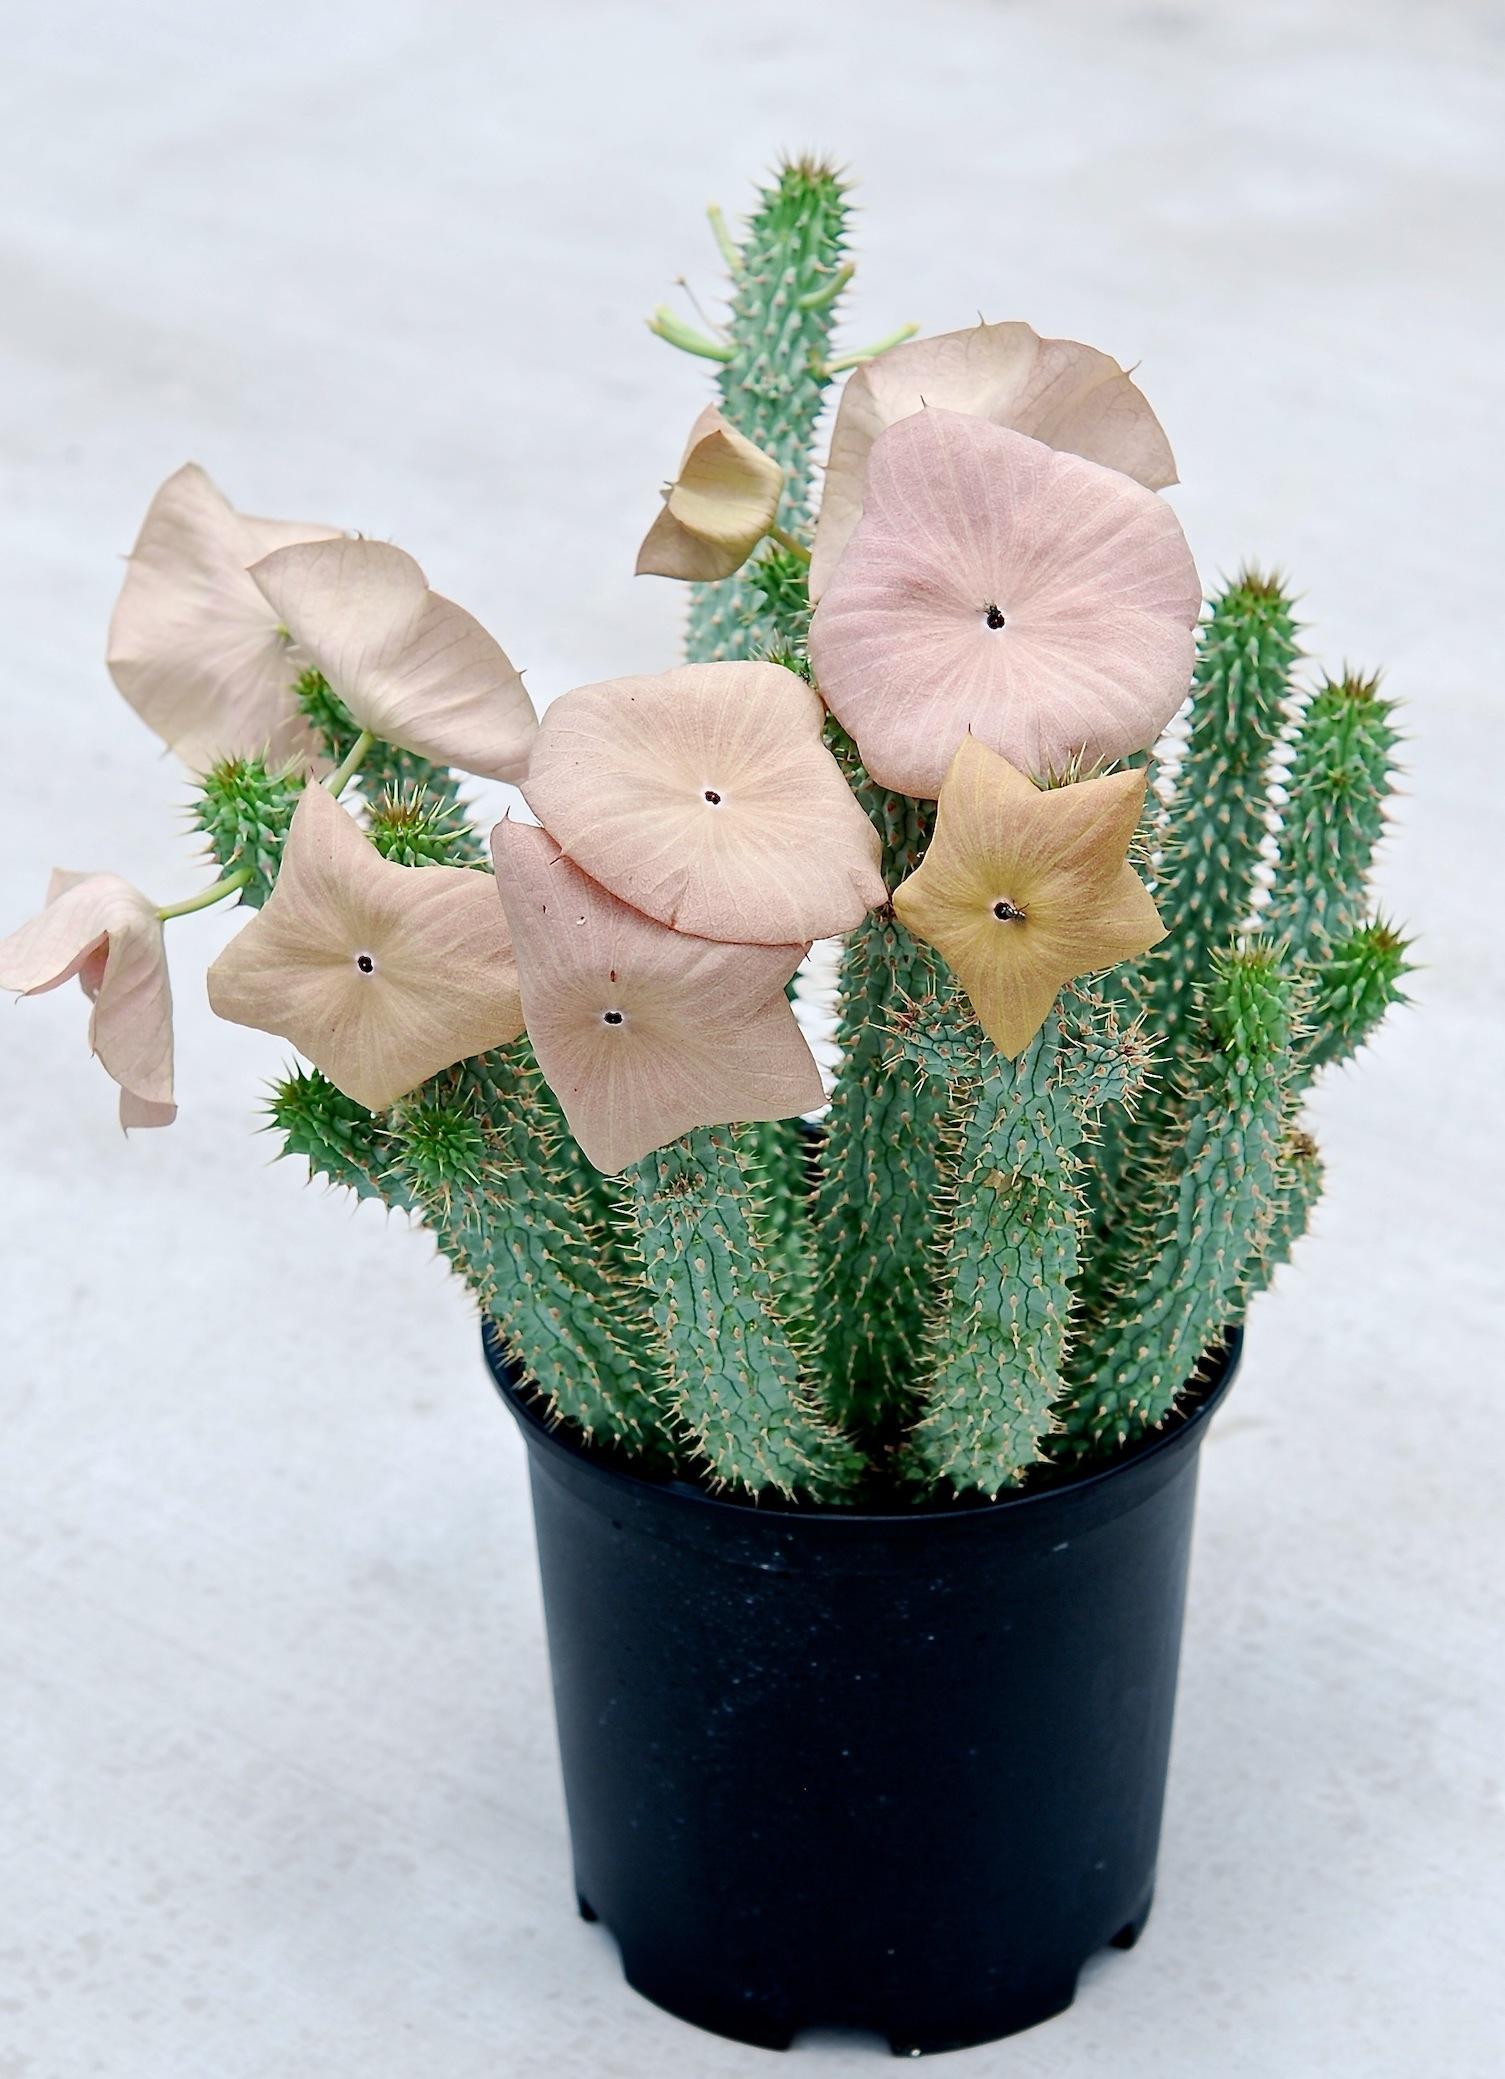 Cultivars Of Hoodia Gordonii Sustainable Bioresources Llc